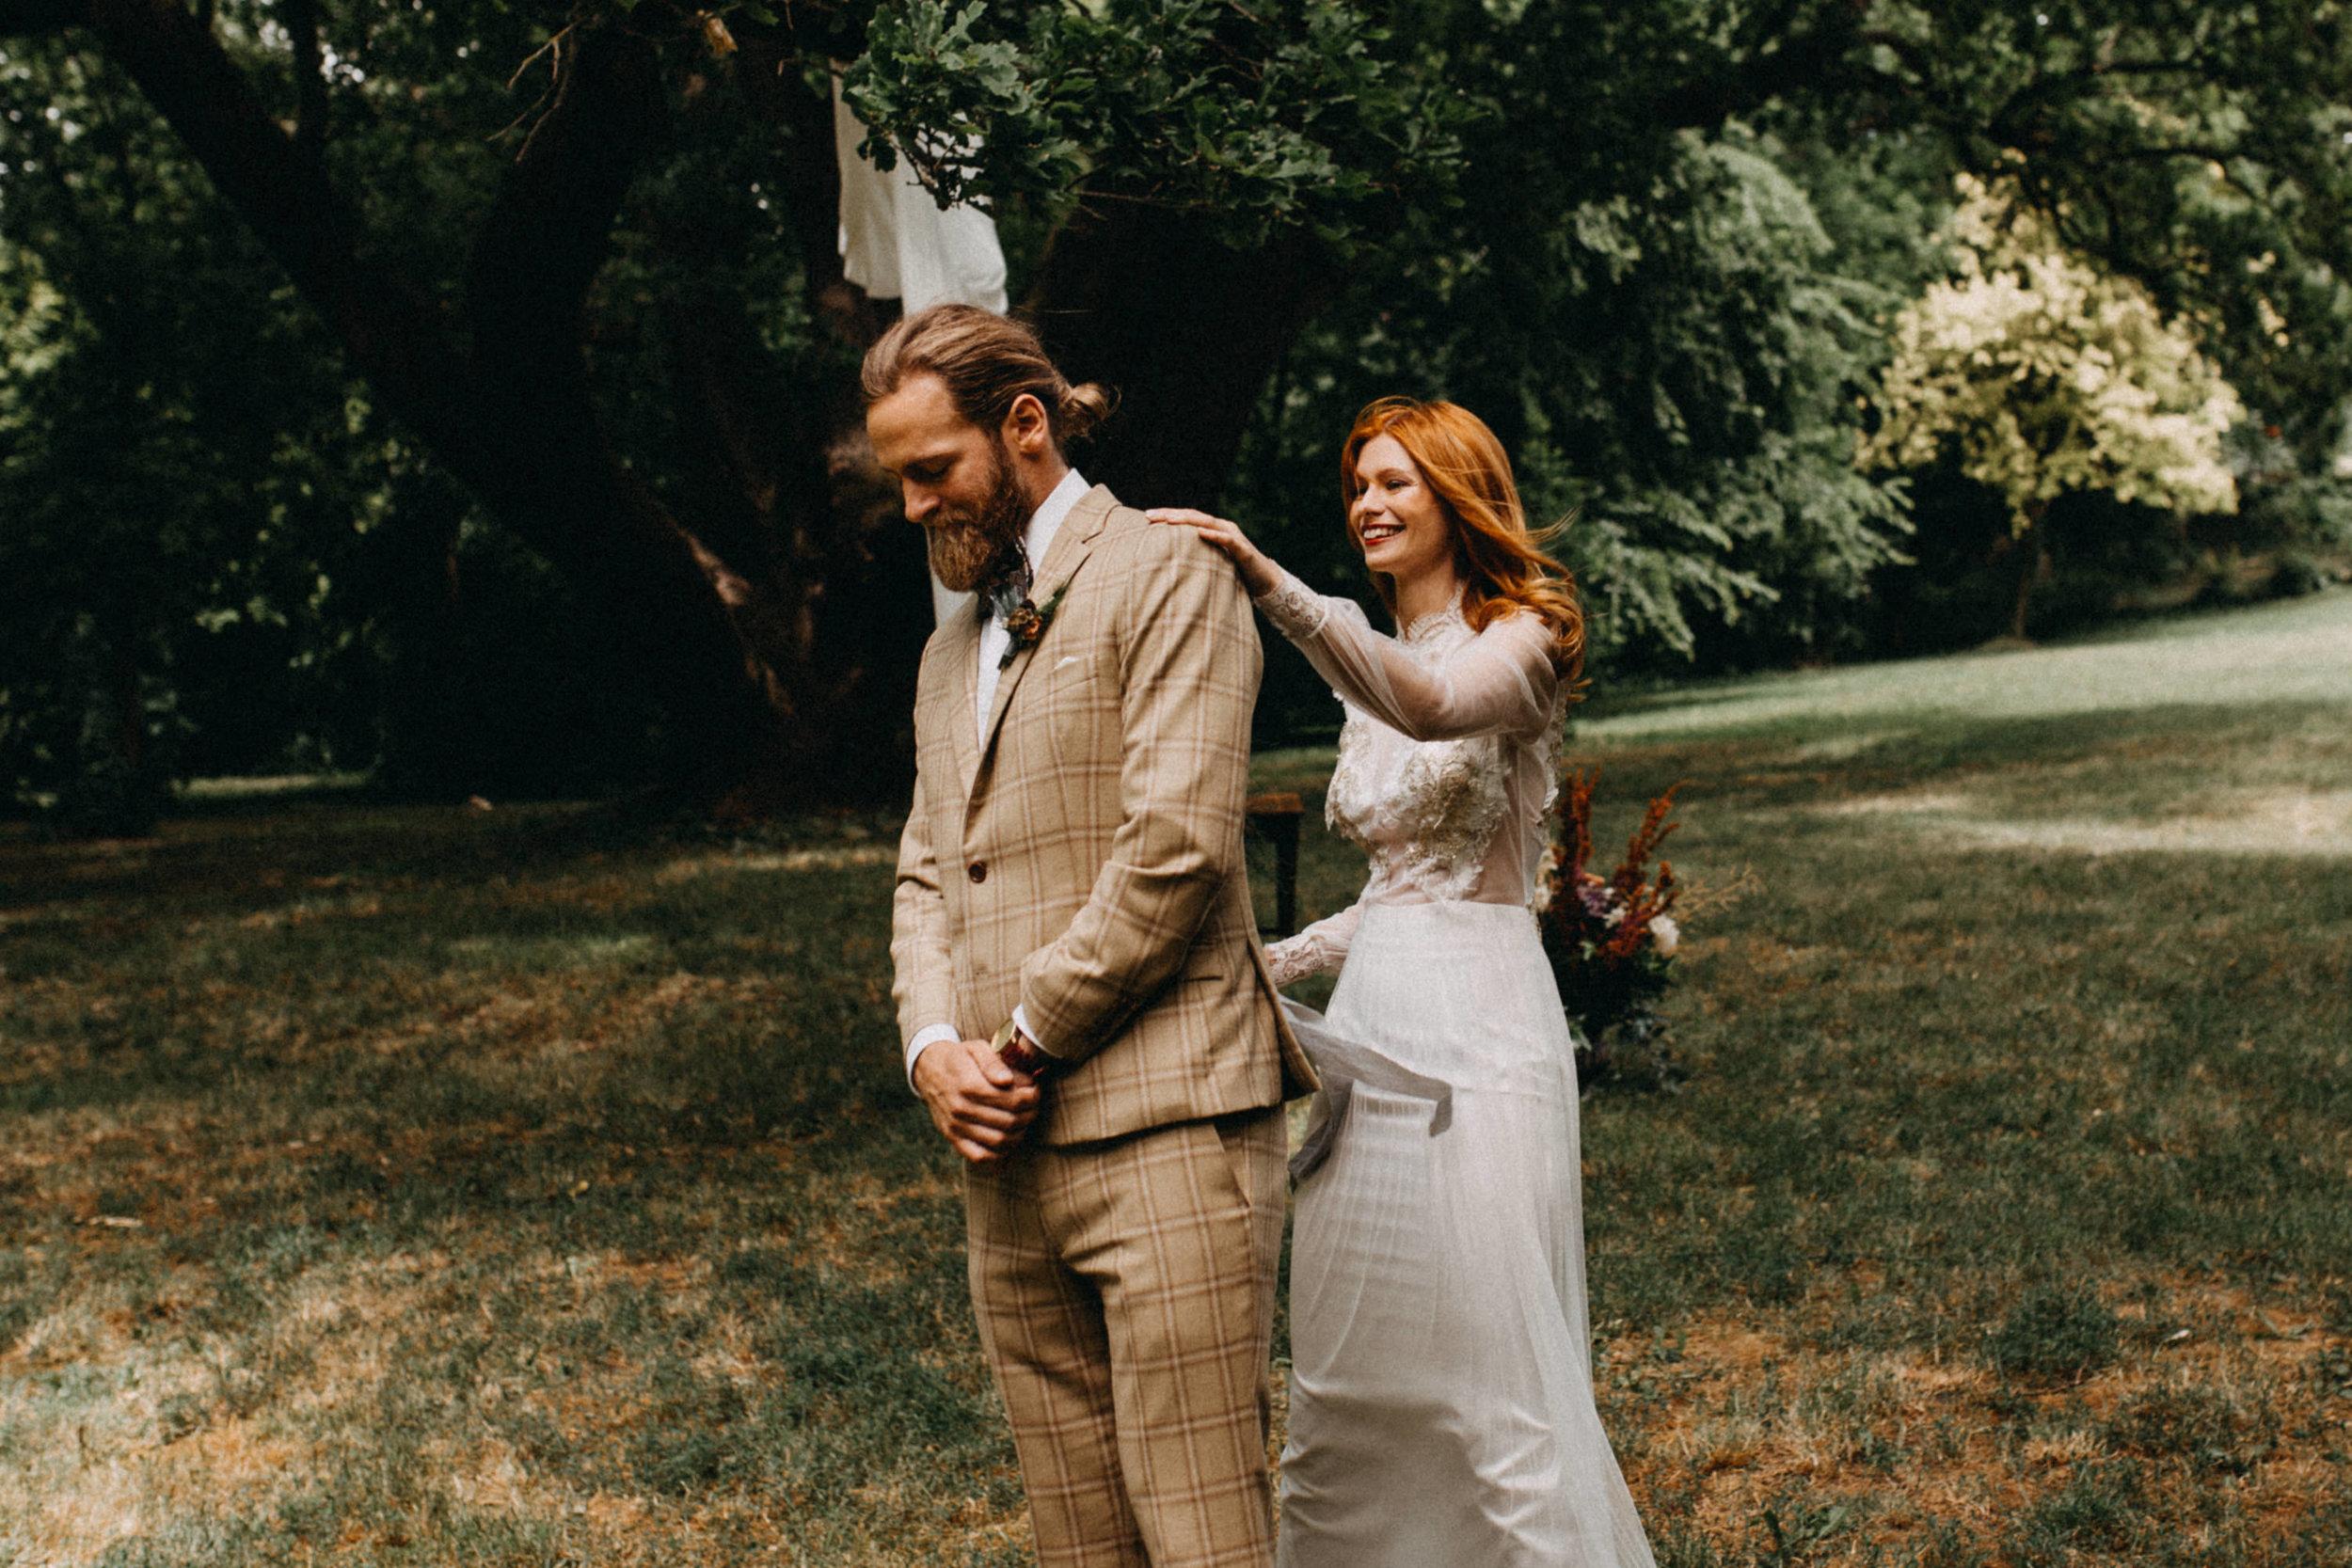 hungary-wedding-40.jpg